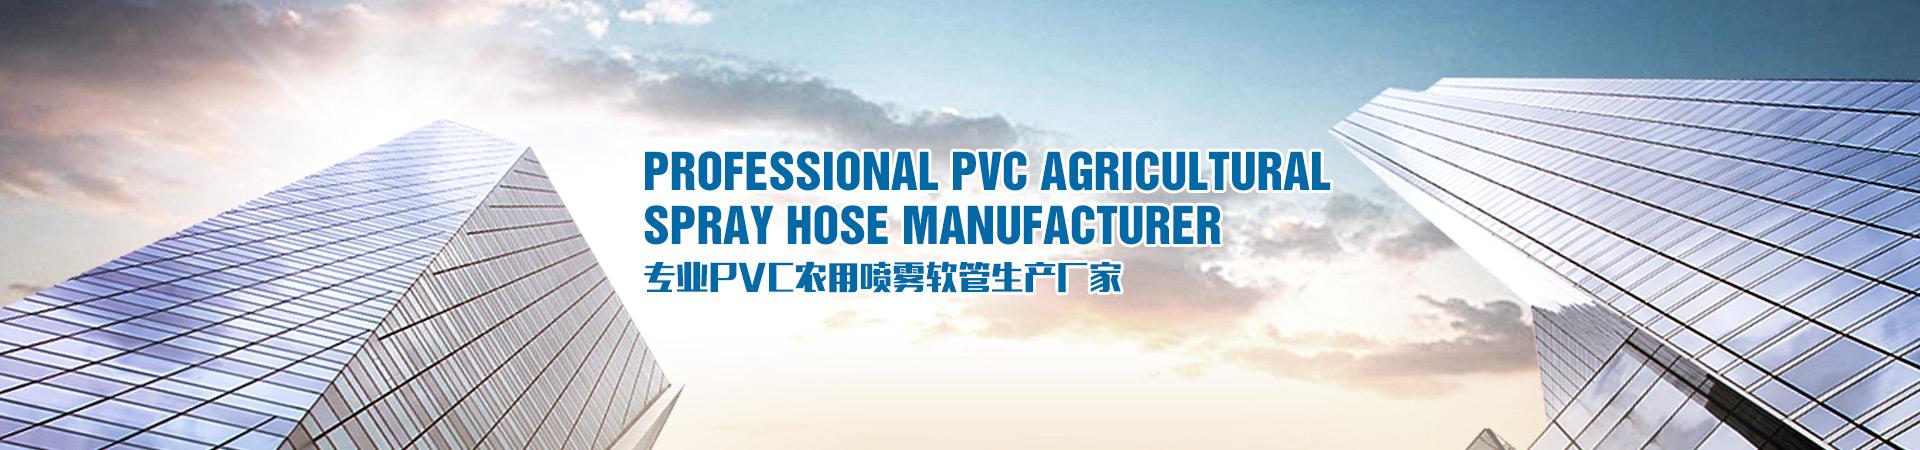 PVC高压喷雾管,清洗机管,打药管